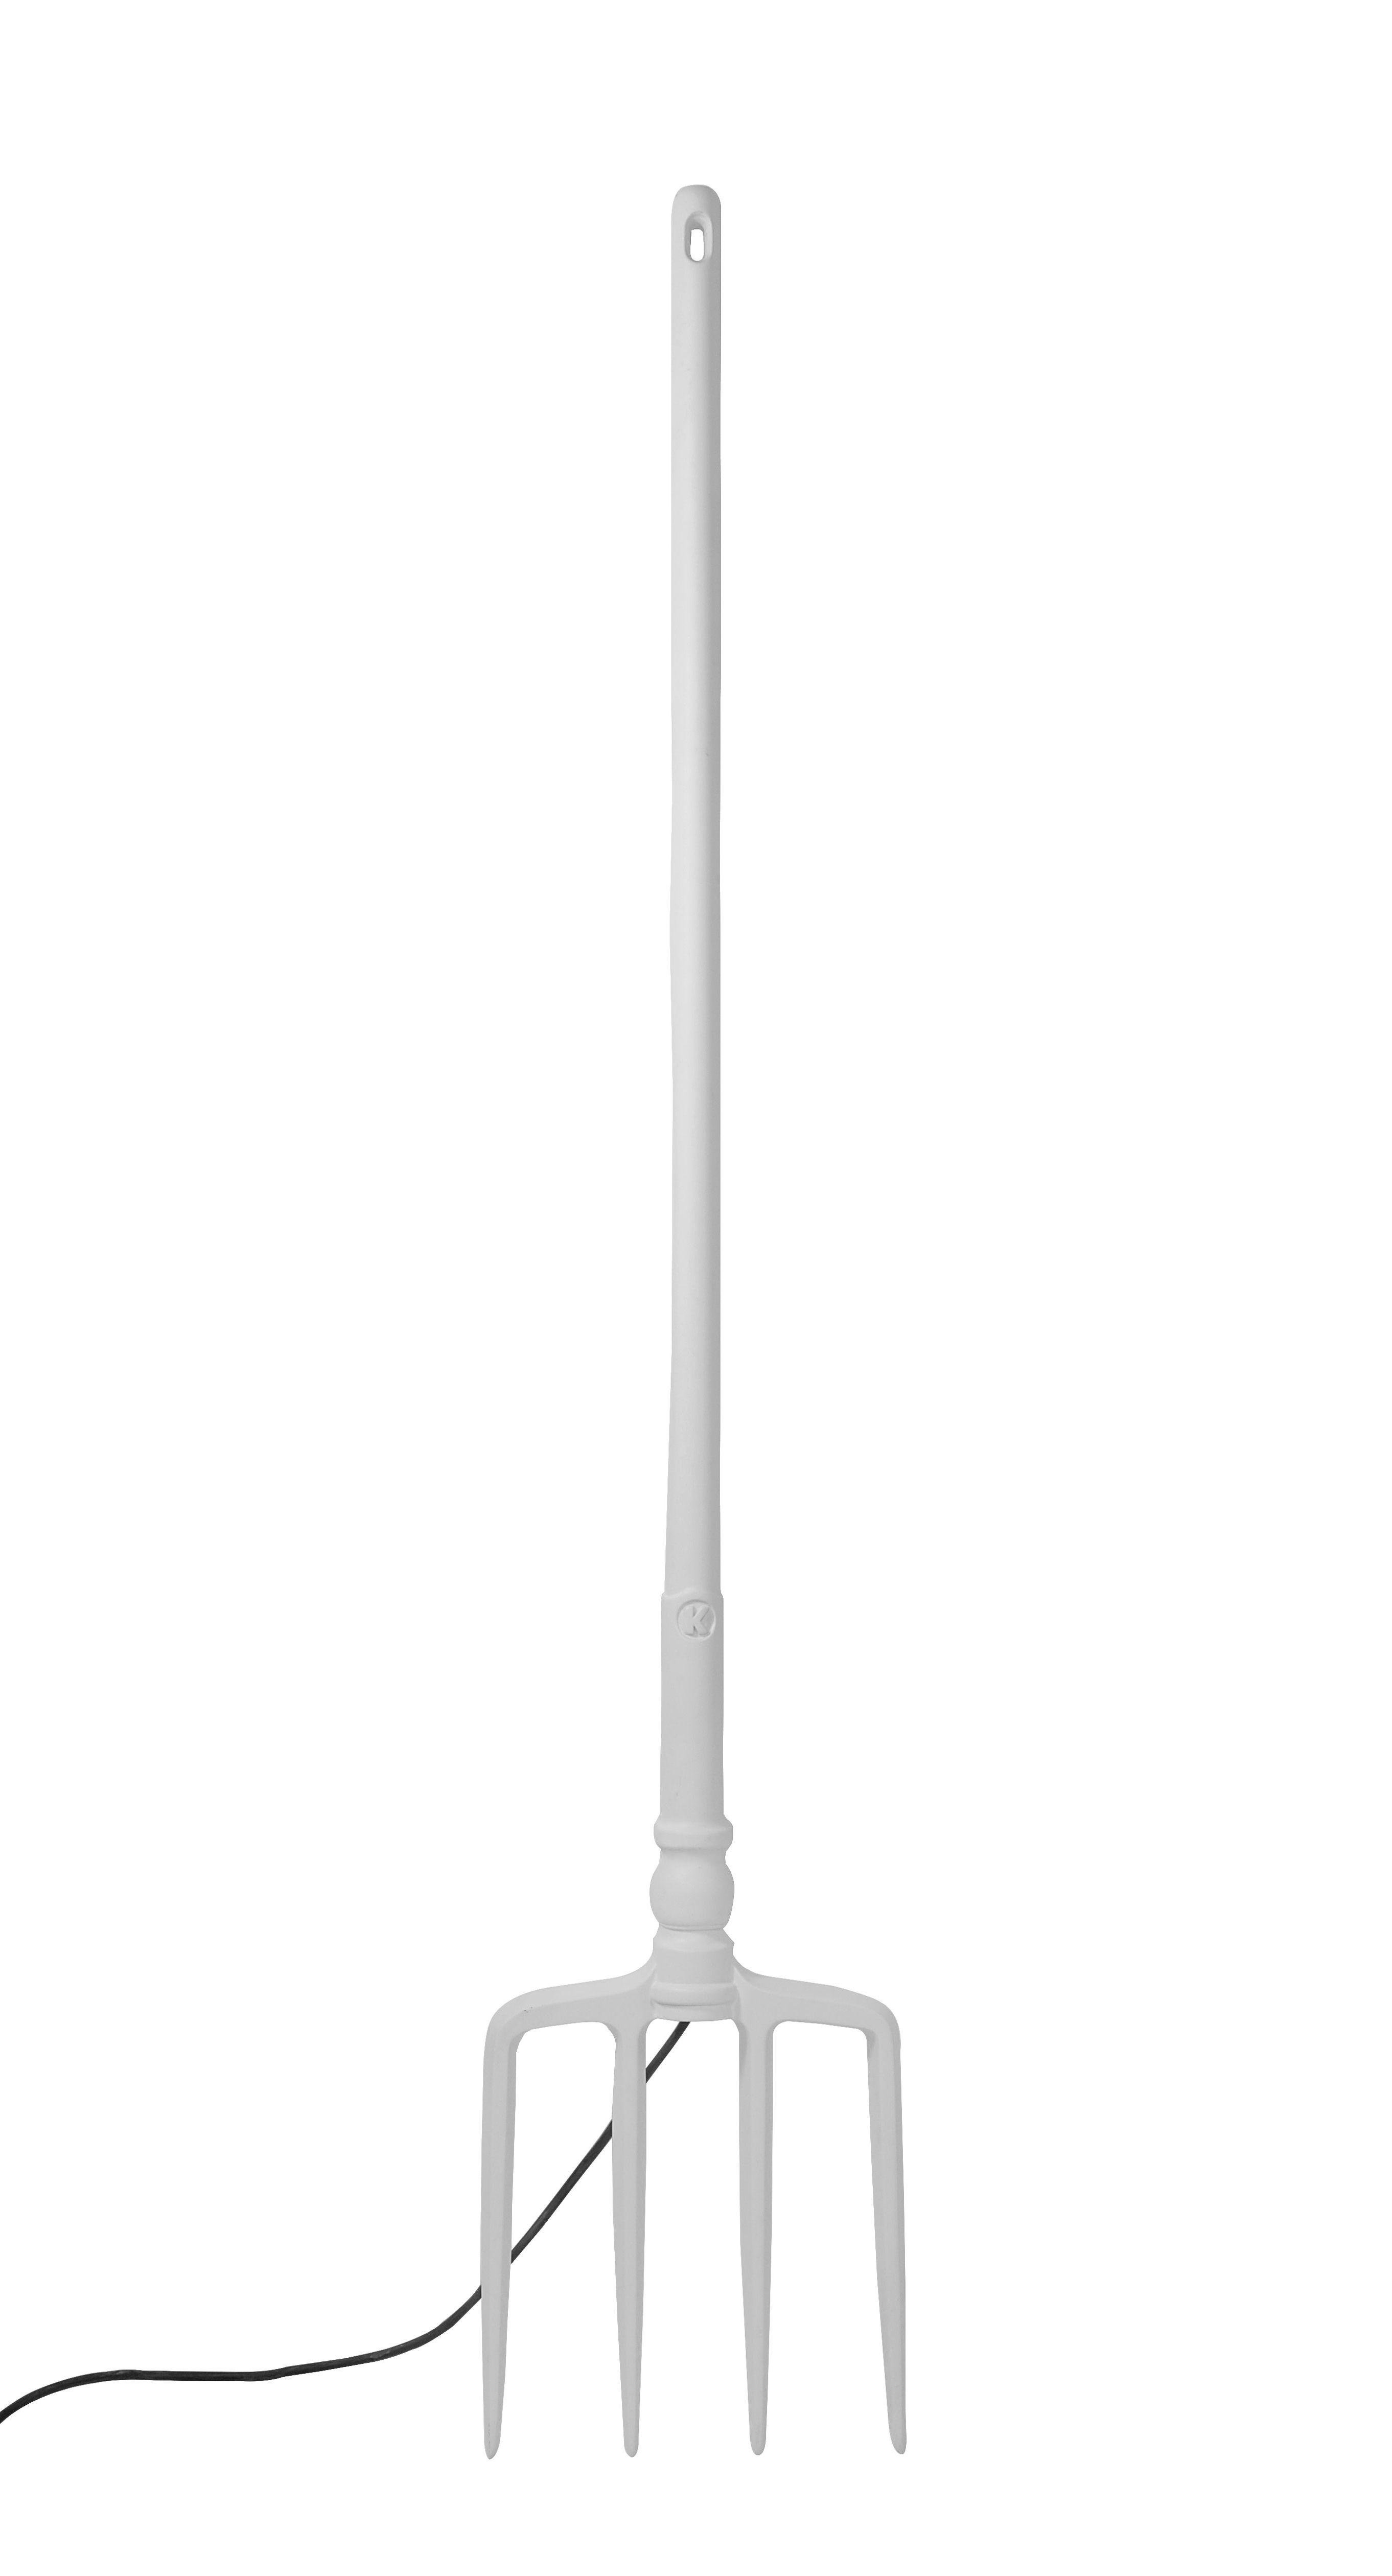 Luminaire - Lampadaires - Lampadaire Tobia LED / Fourche - H 165 cm - Karman - Fourche / Blanc - Technopolymère